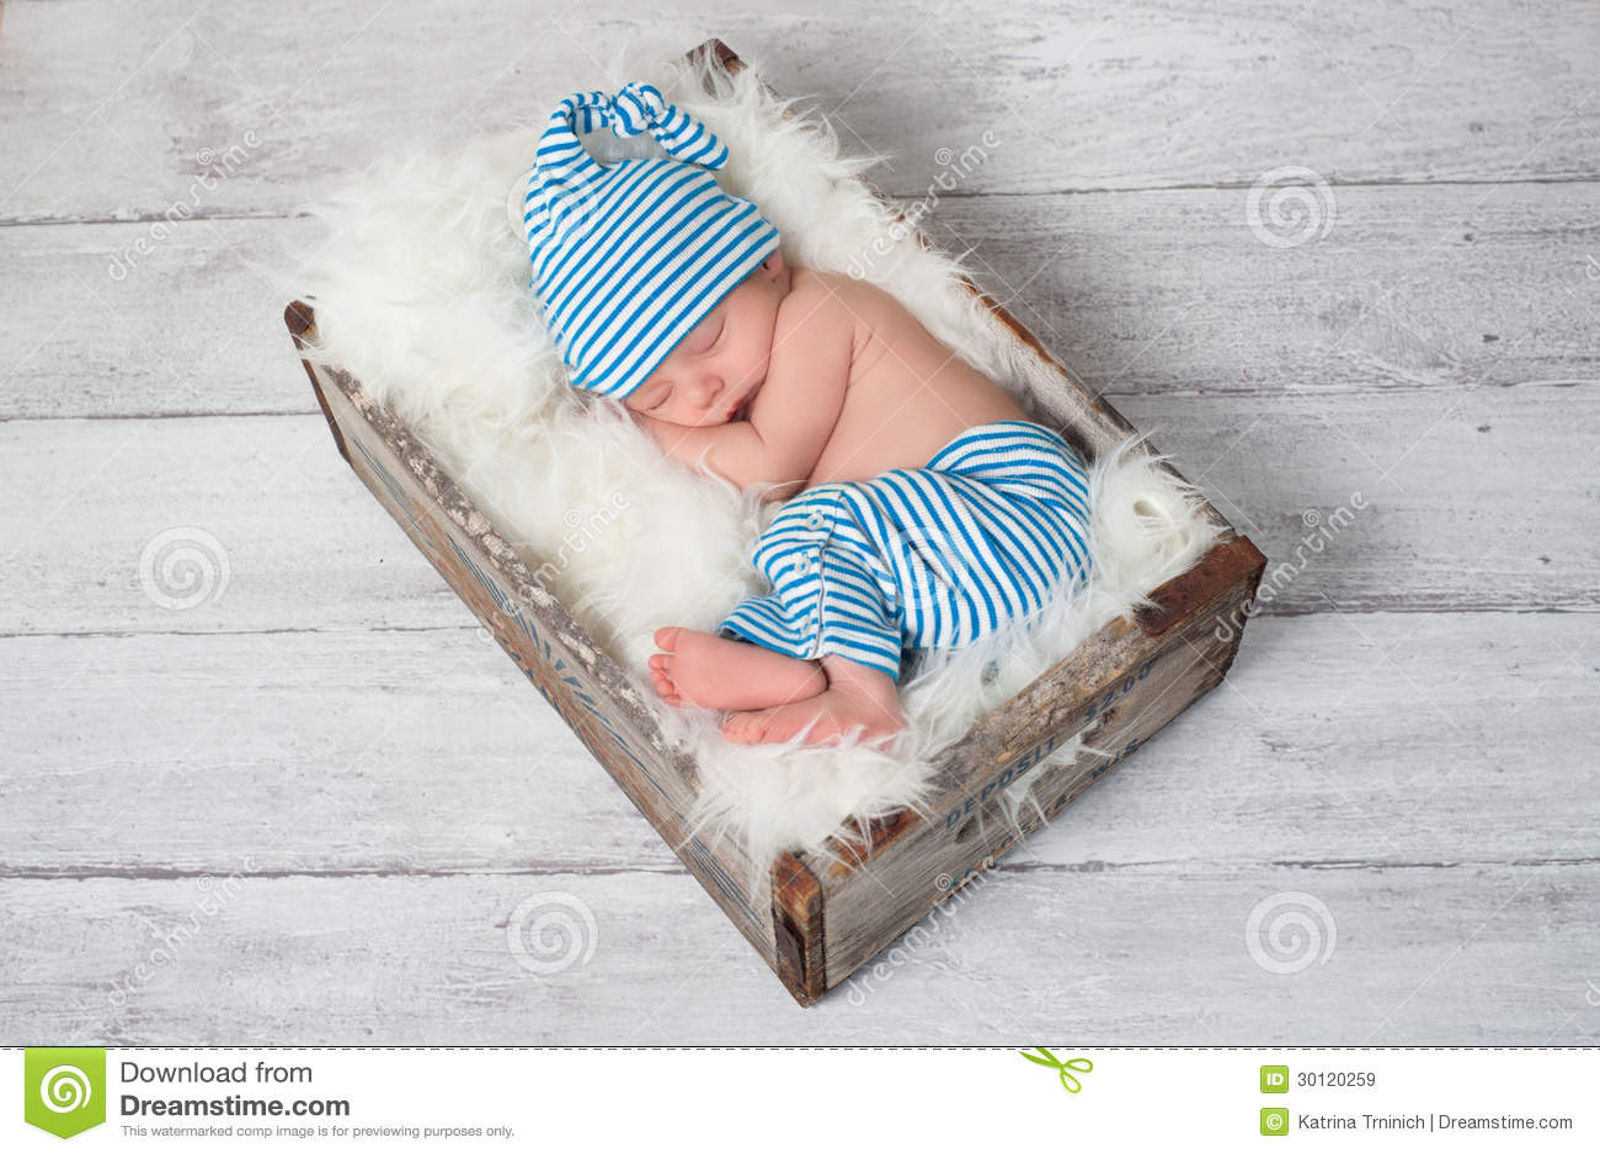 Sleeping Newborn Baby Wearing Pajamas Royalty Free Stock